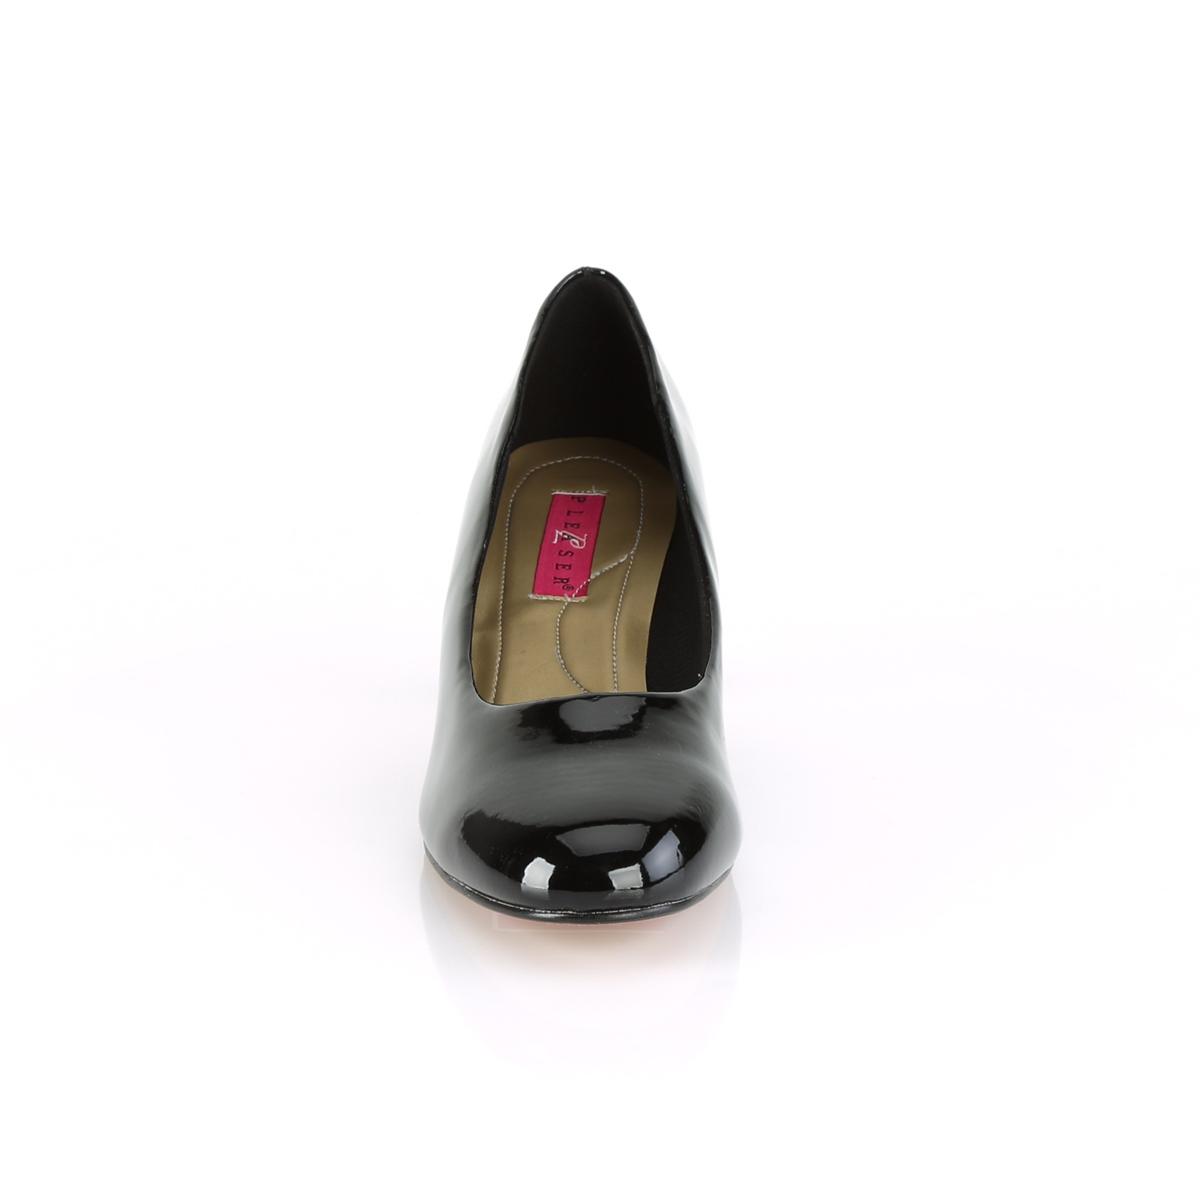 Pleaser Pink Label FEFE-01 パンプス 2 1/4inch Heel Classic Pump◆取り寄せ